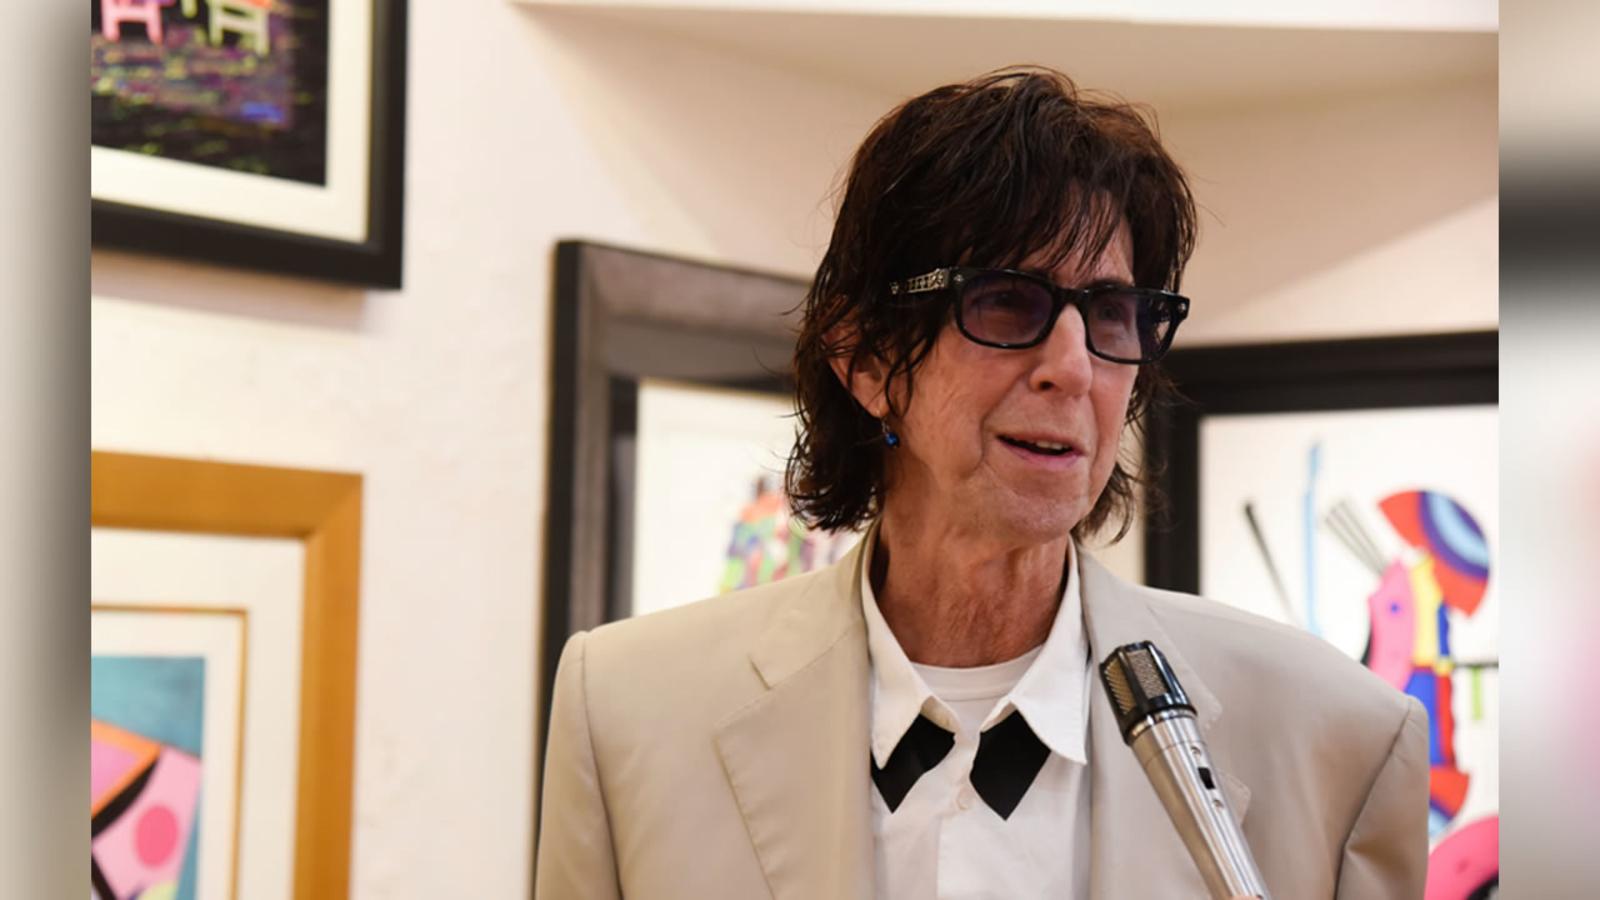 The Cars lead singer Ric Ocasek found dead in Manhattan apartment, sources say